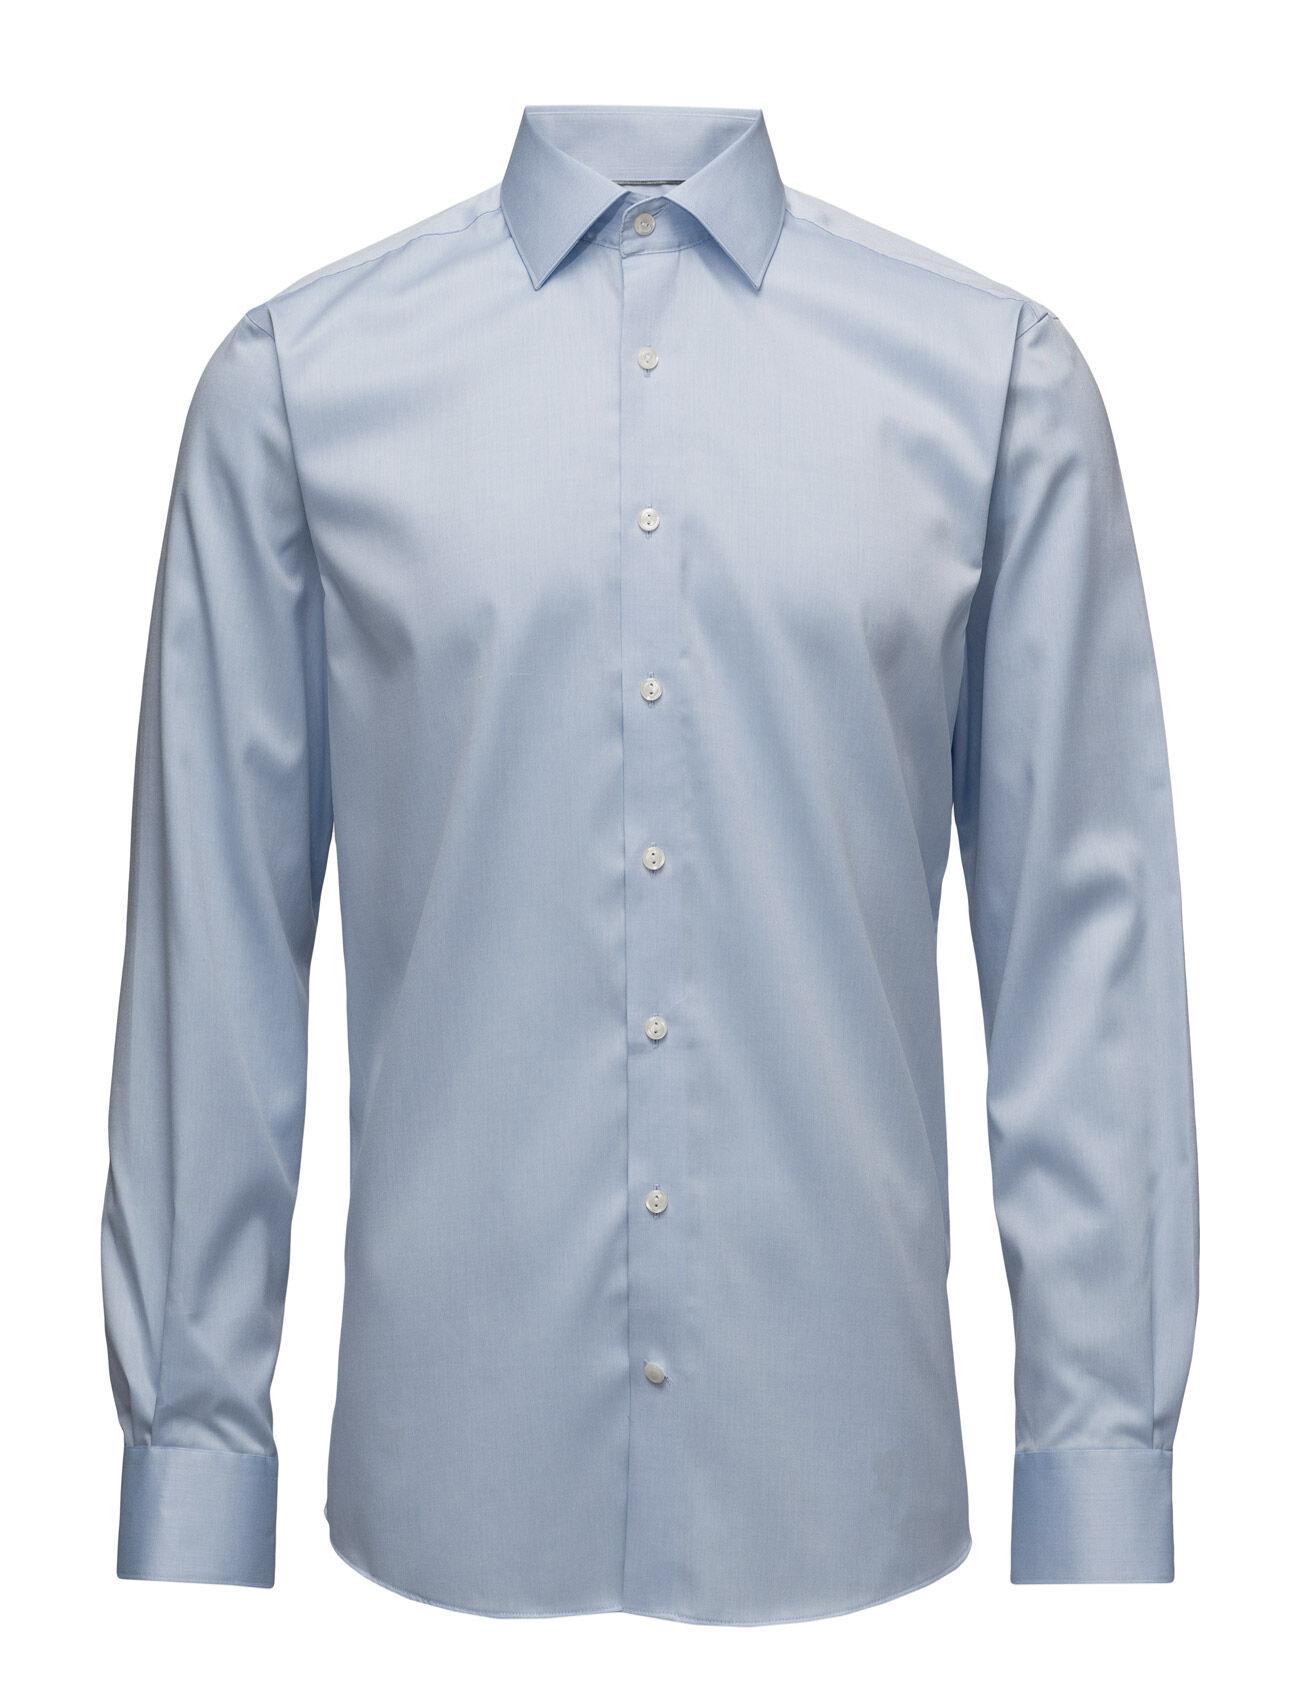 Lindbergh Plain Fine Twill Shirt,Wf